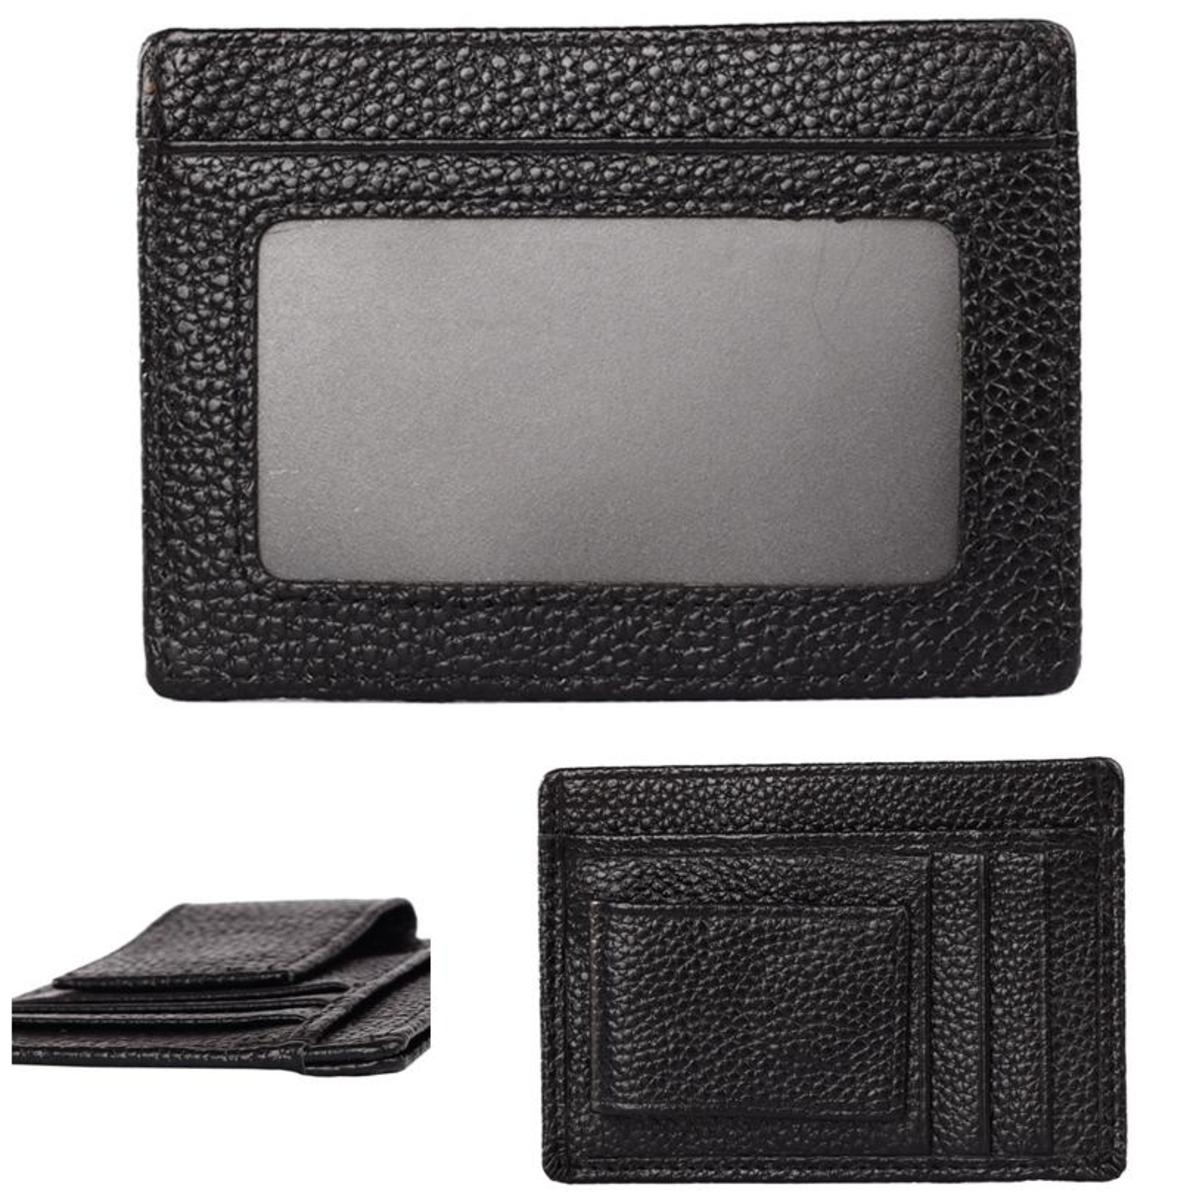 Magnetic Imitation leather Wallet(black)